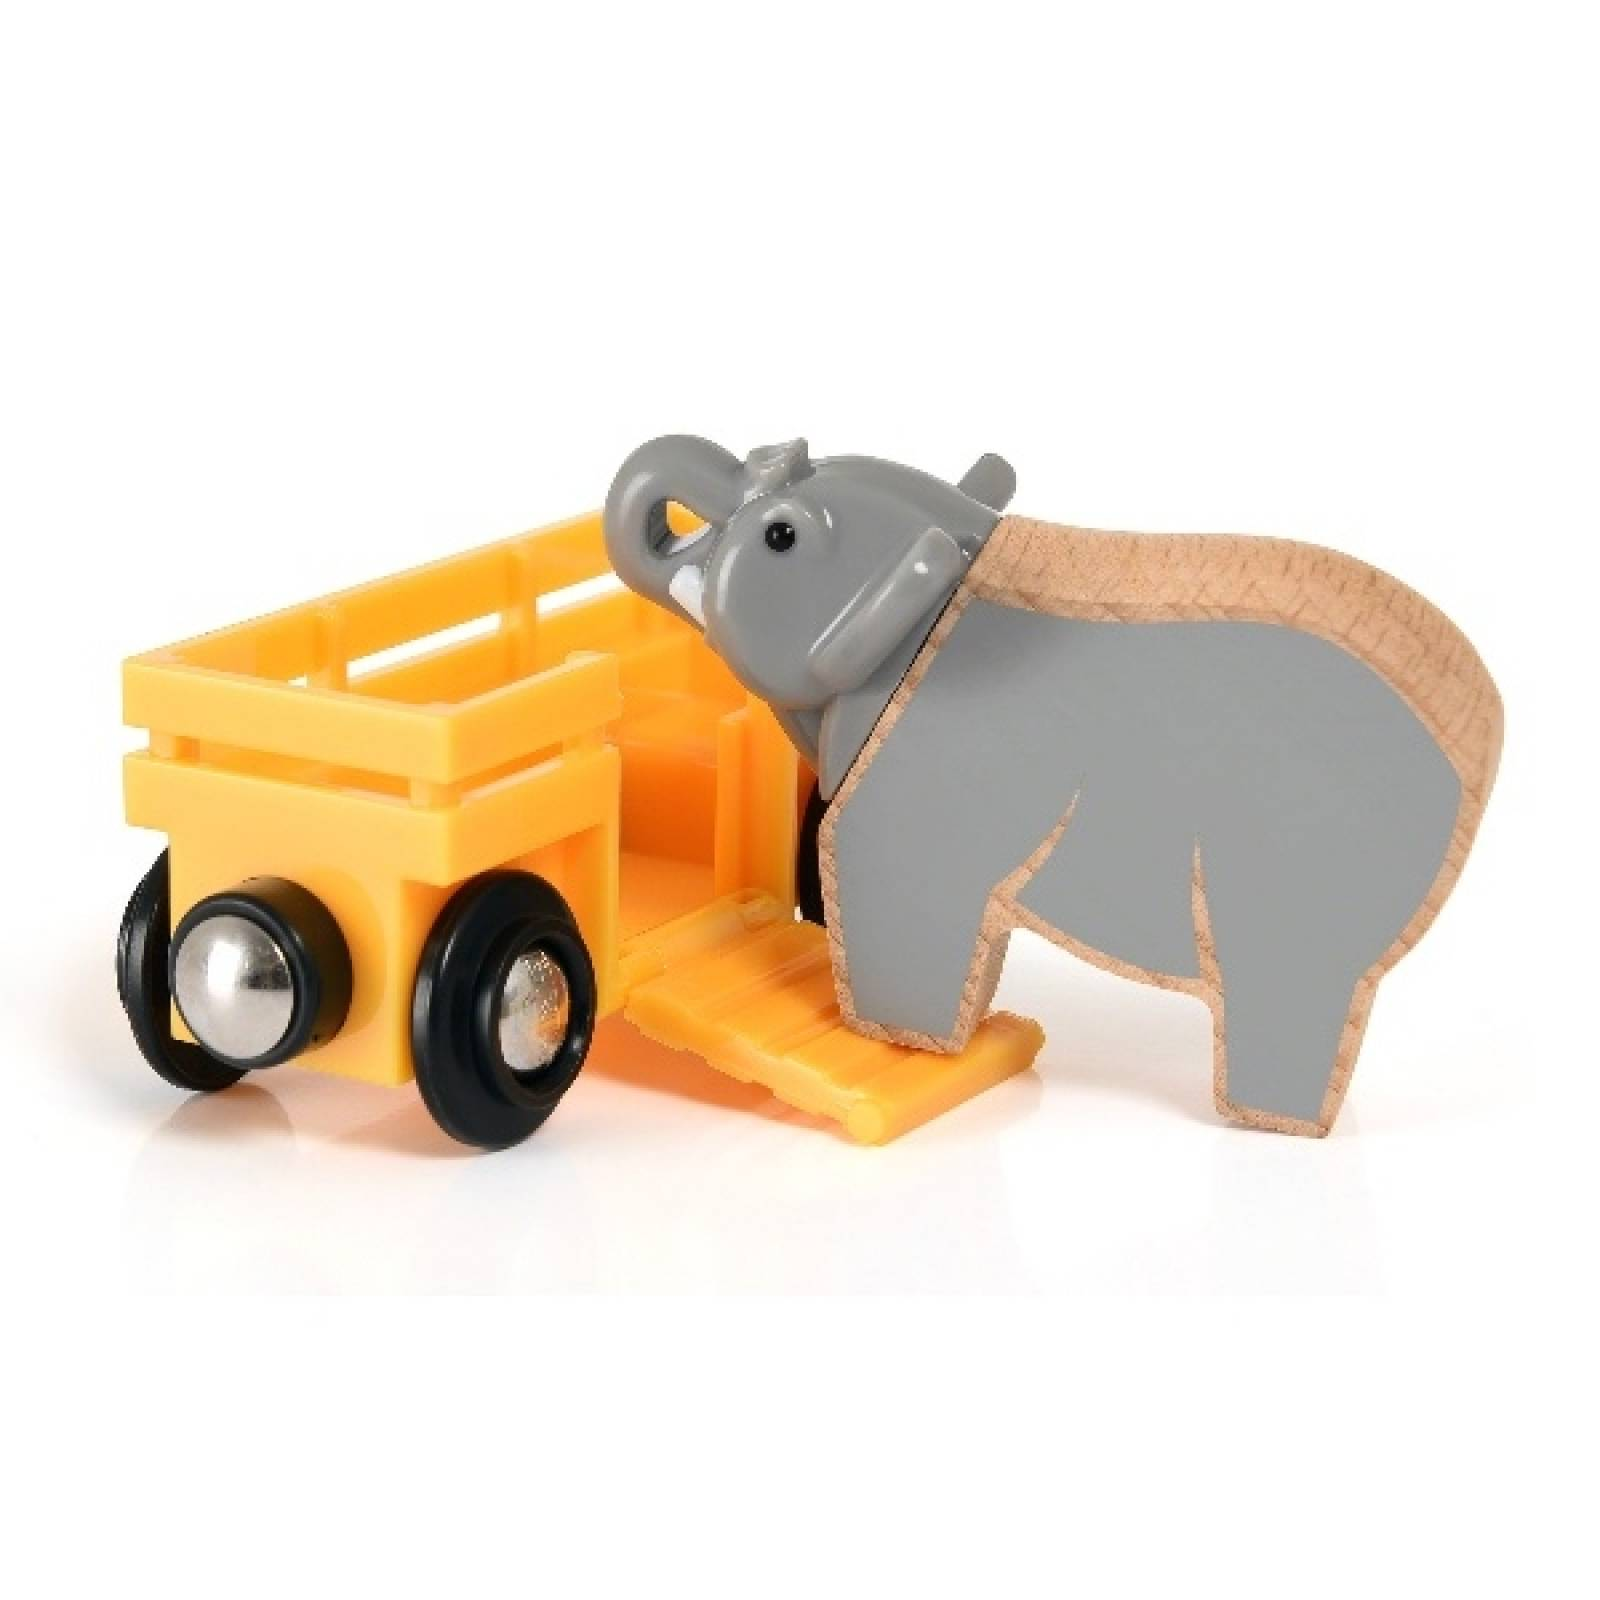 Elephant & Wagon BRIO Wooden Railway Age 3+ thumbnails